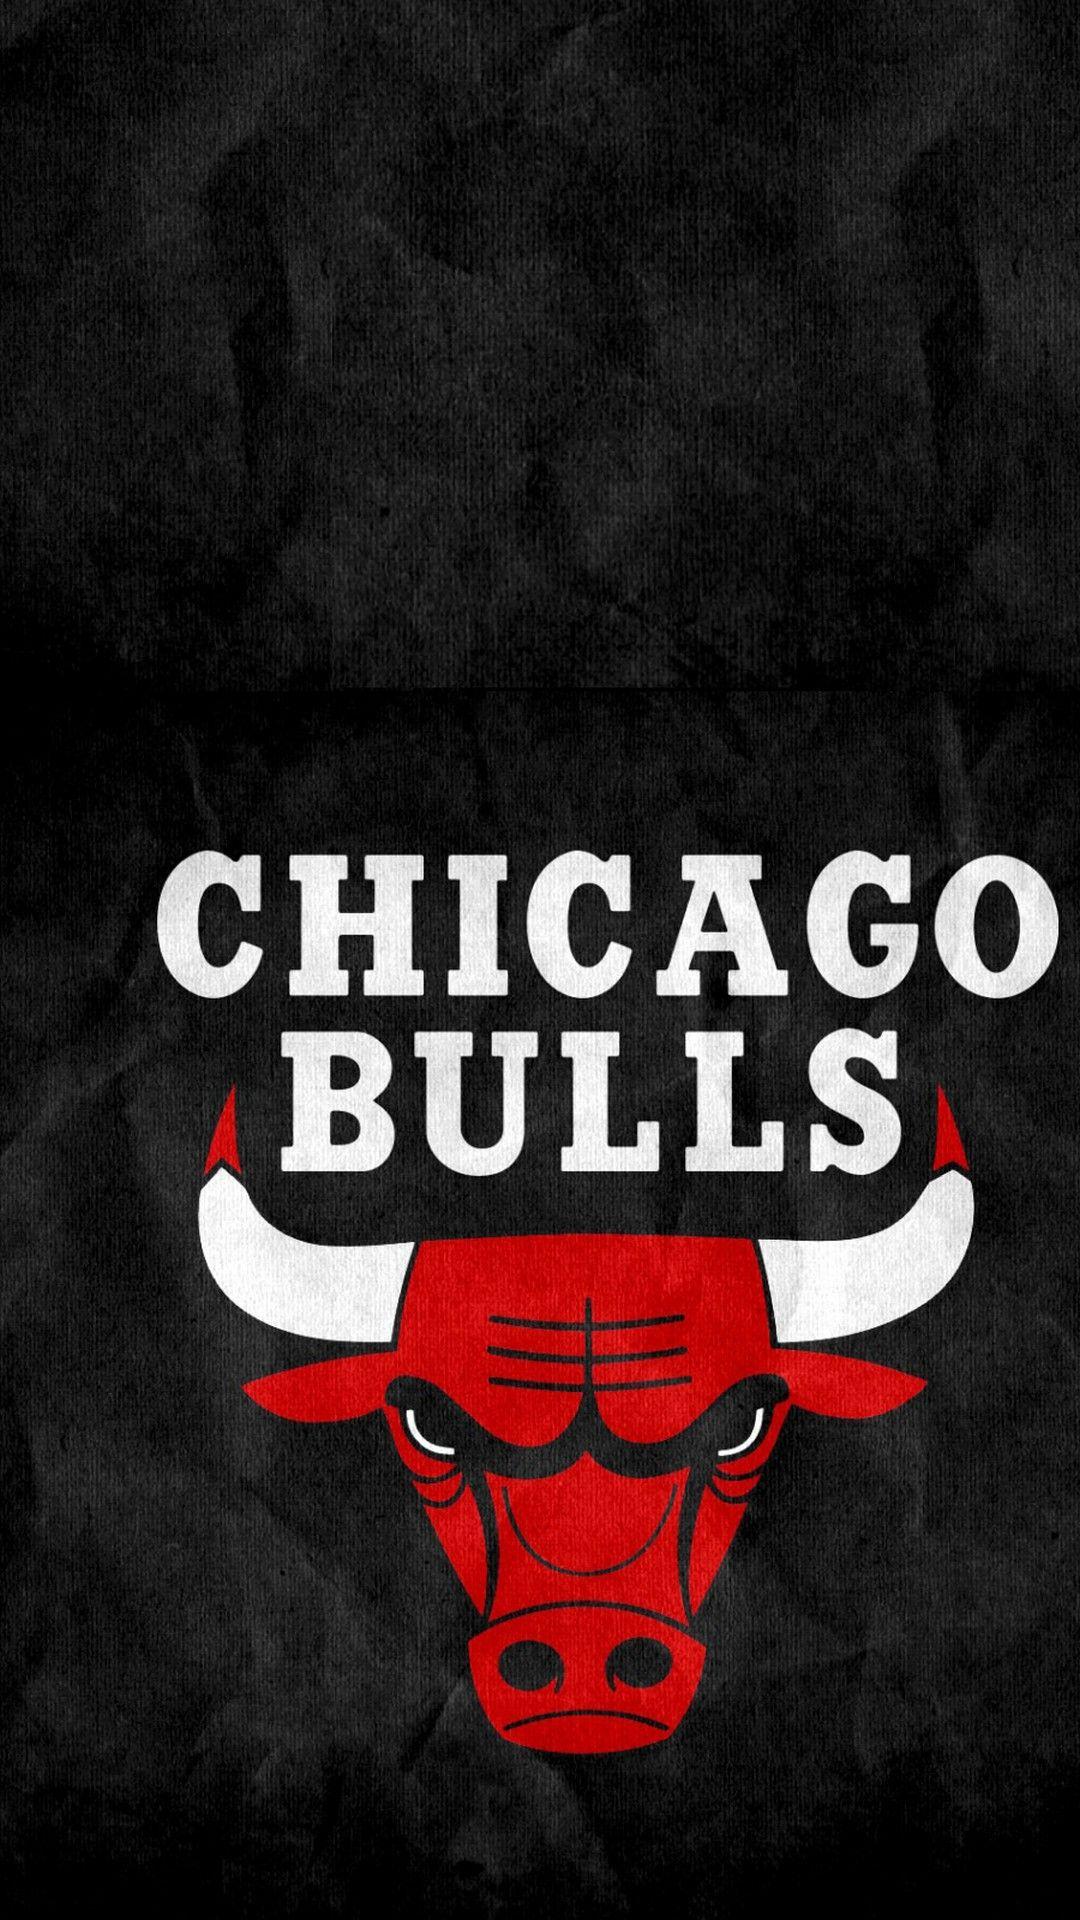 Chicago Bulls Iphone 7 Plus Wallpaper 2021 Basketball Wallpaper Iphone 7 Plus Wallpaper 7 Plus Wallpaper Chicago Bulls